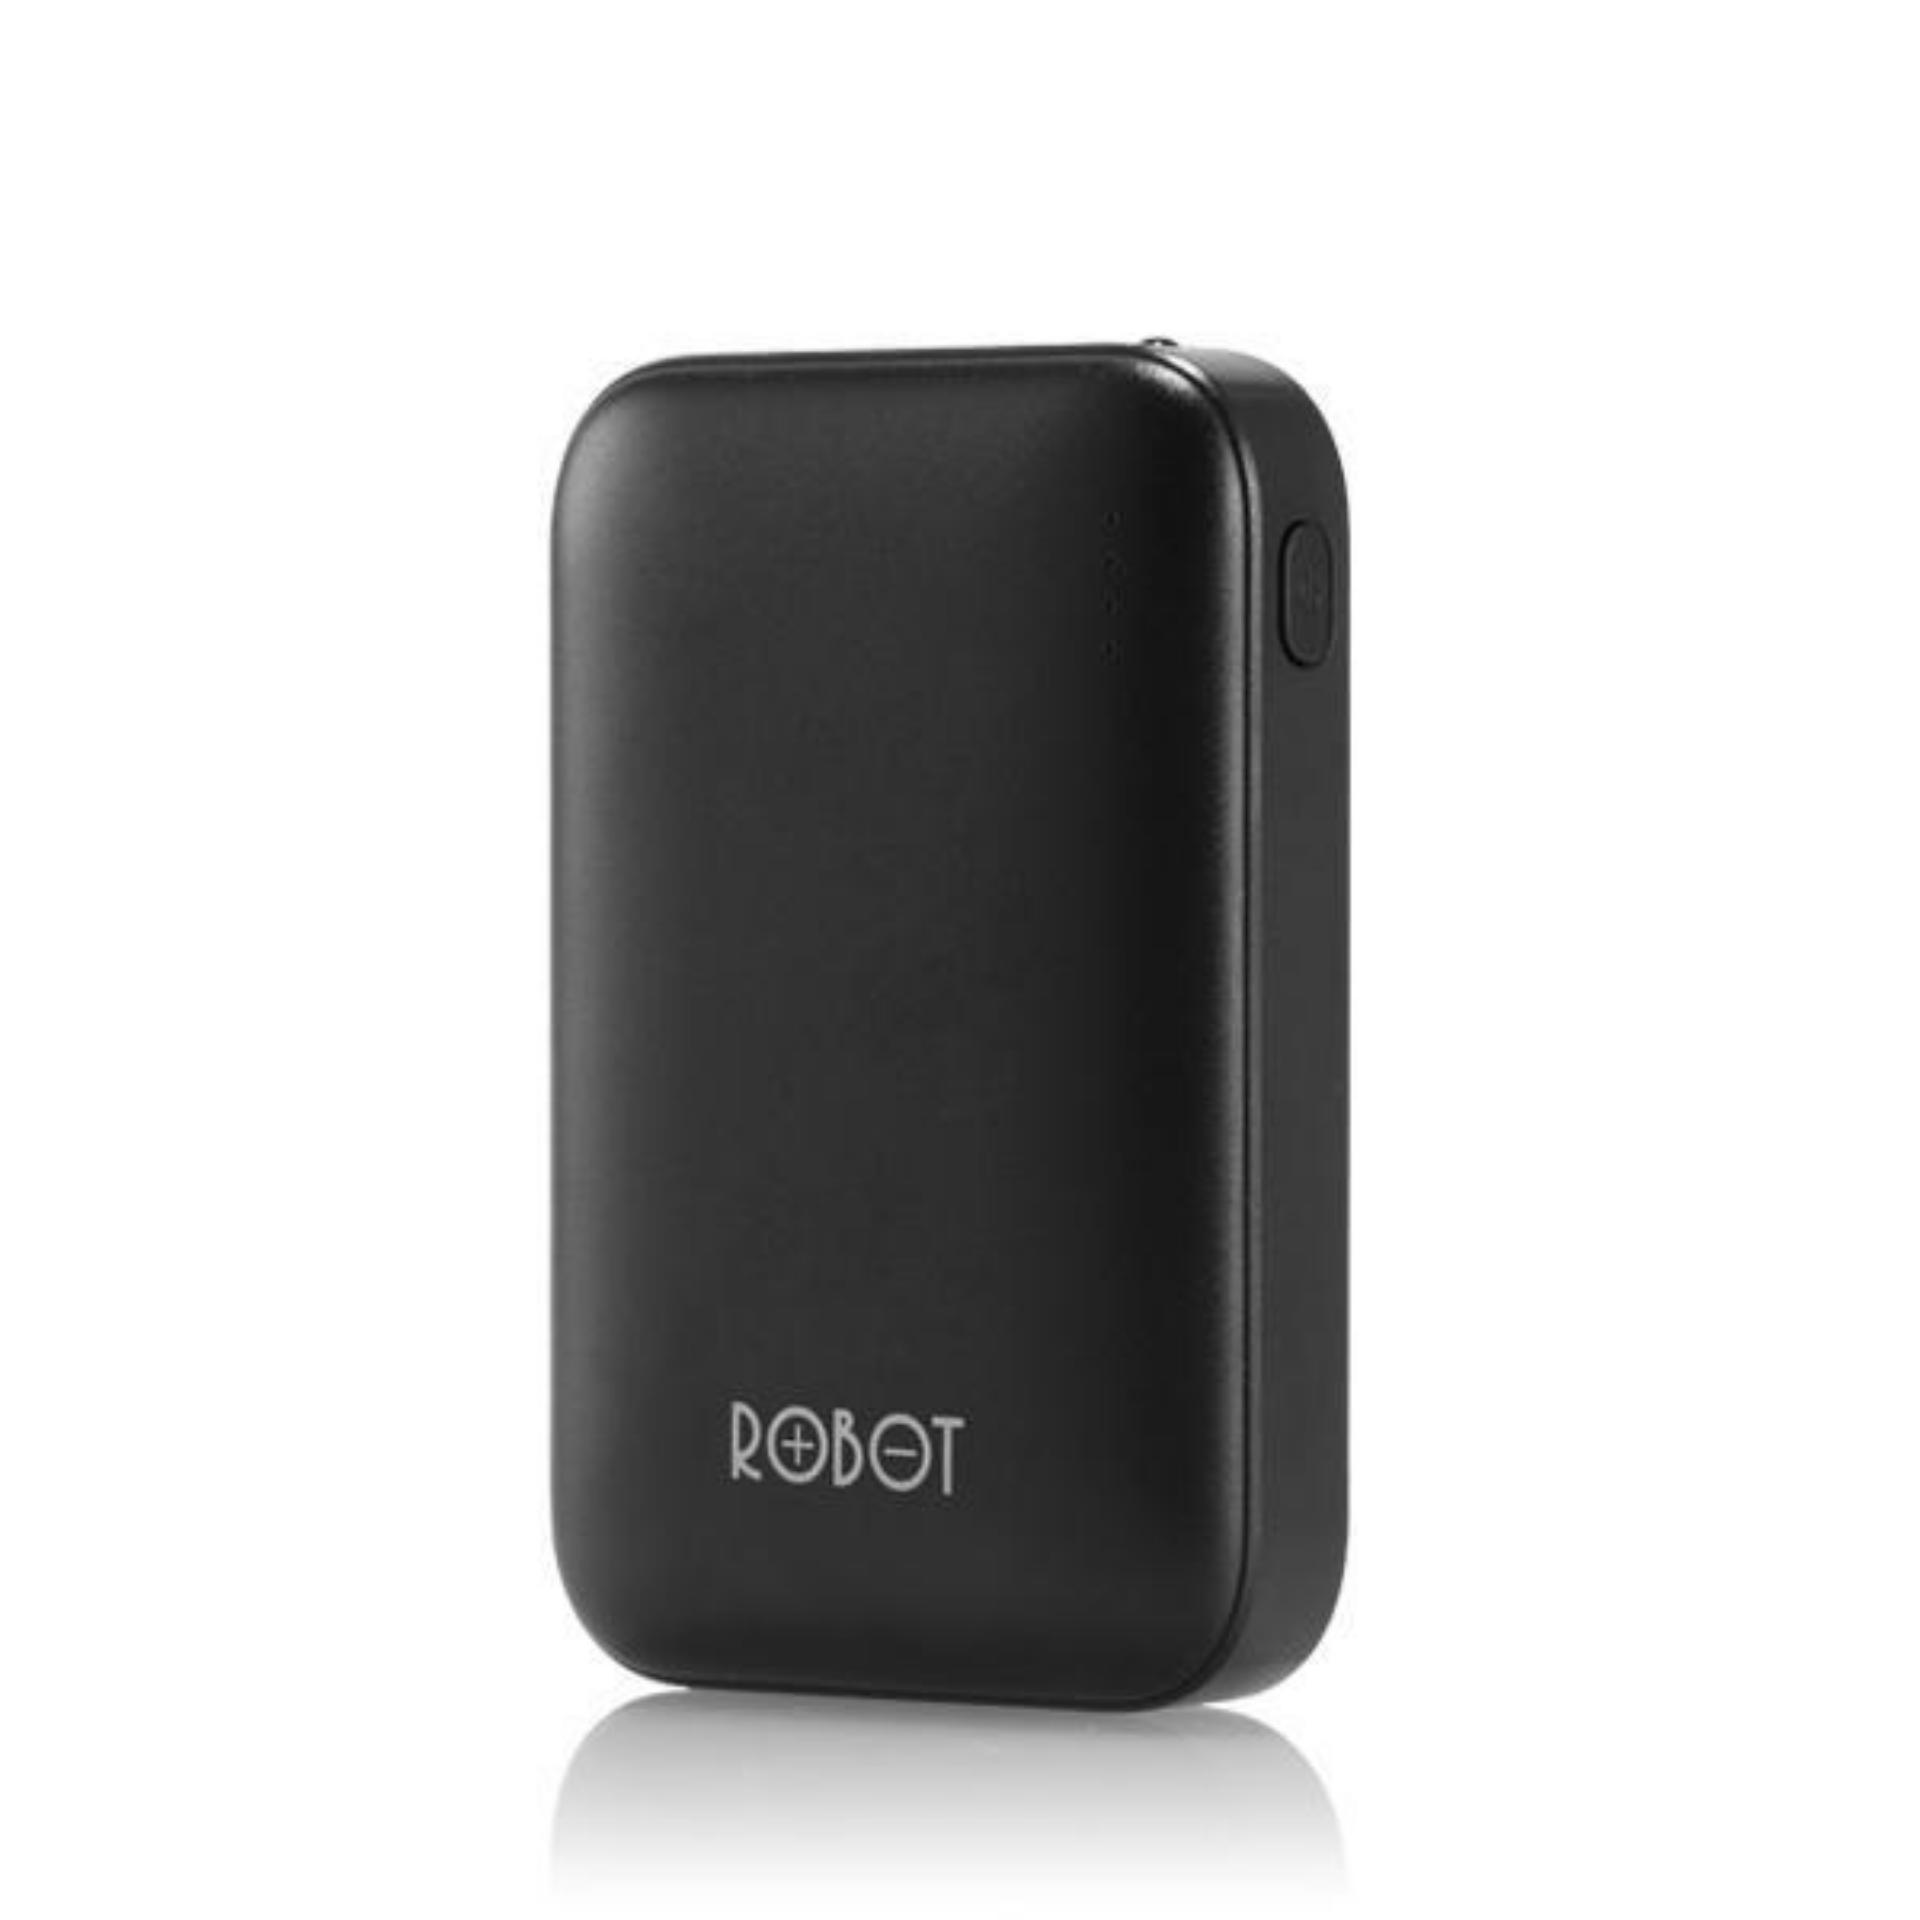 Vivan Robot RT7200 6600mAh 2 USB Ports Power Bank Black Bergaransi Resmi 1Tahun